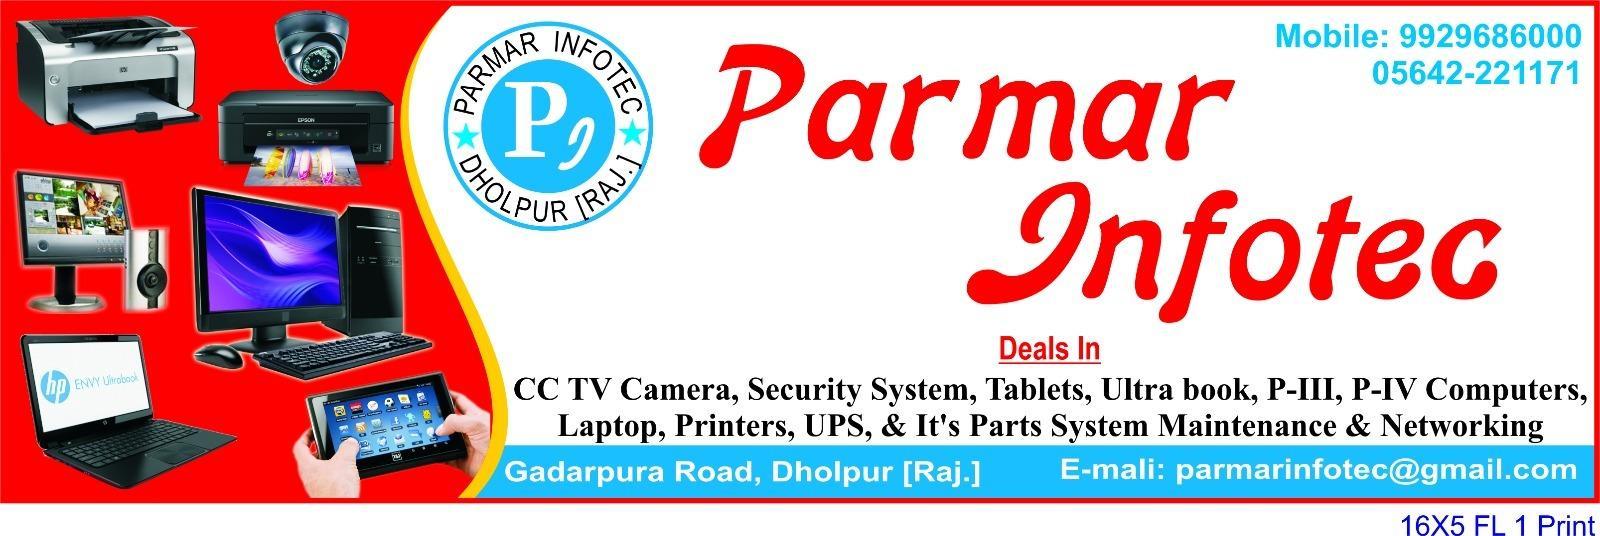 WWW.PARMARINFOTEC.COM - by Parmar Infotec, Dholpur